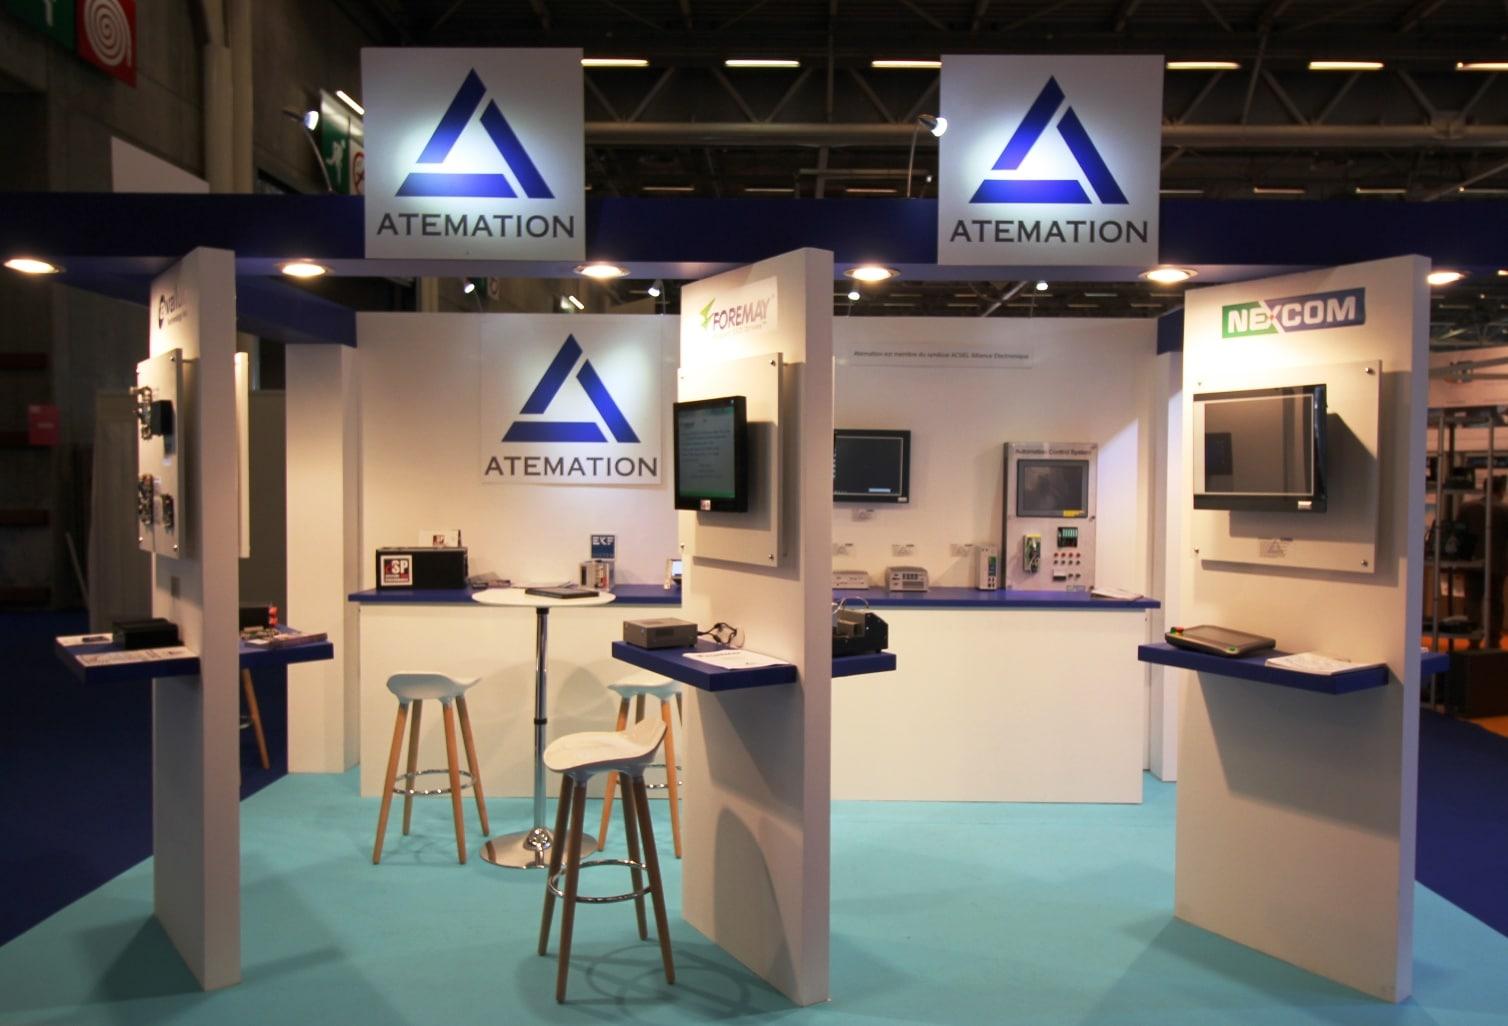 Atemation exposant au salon embedded systems 2017 for Salon industrie paris 2017